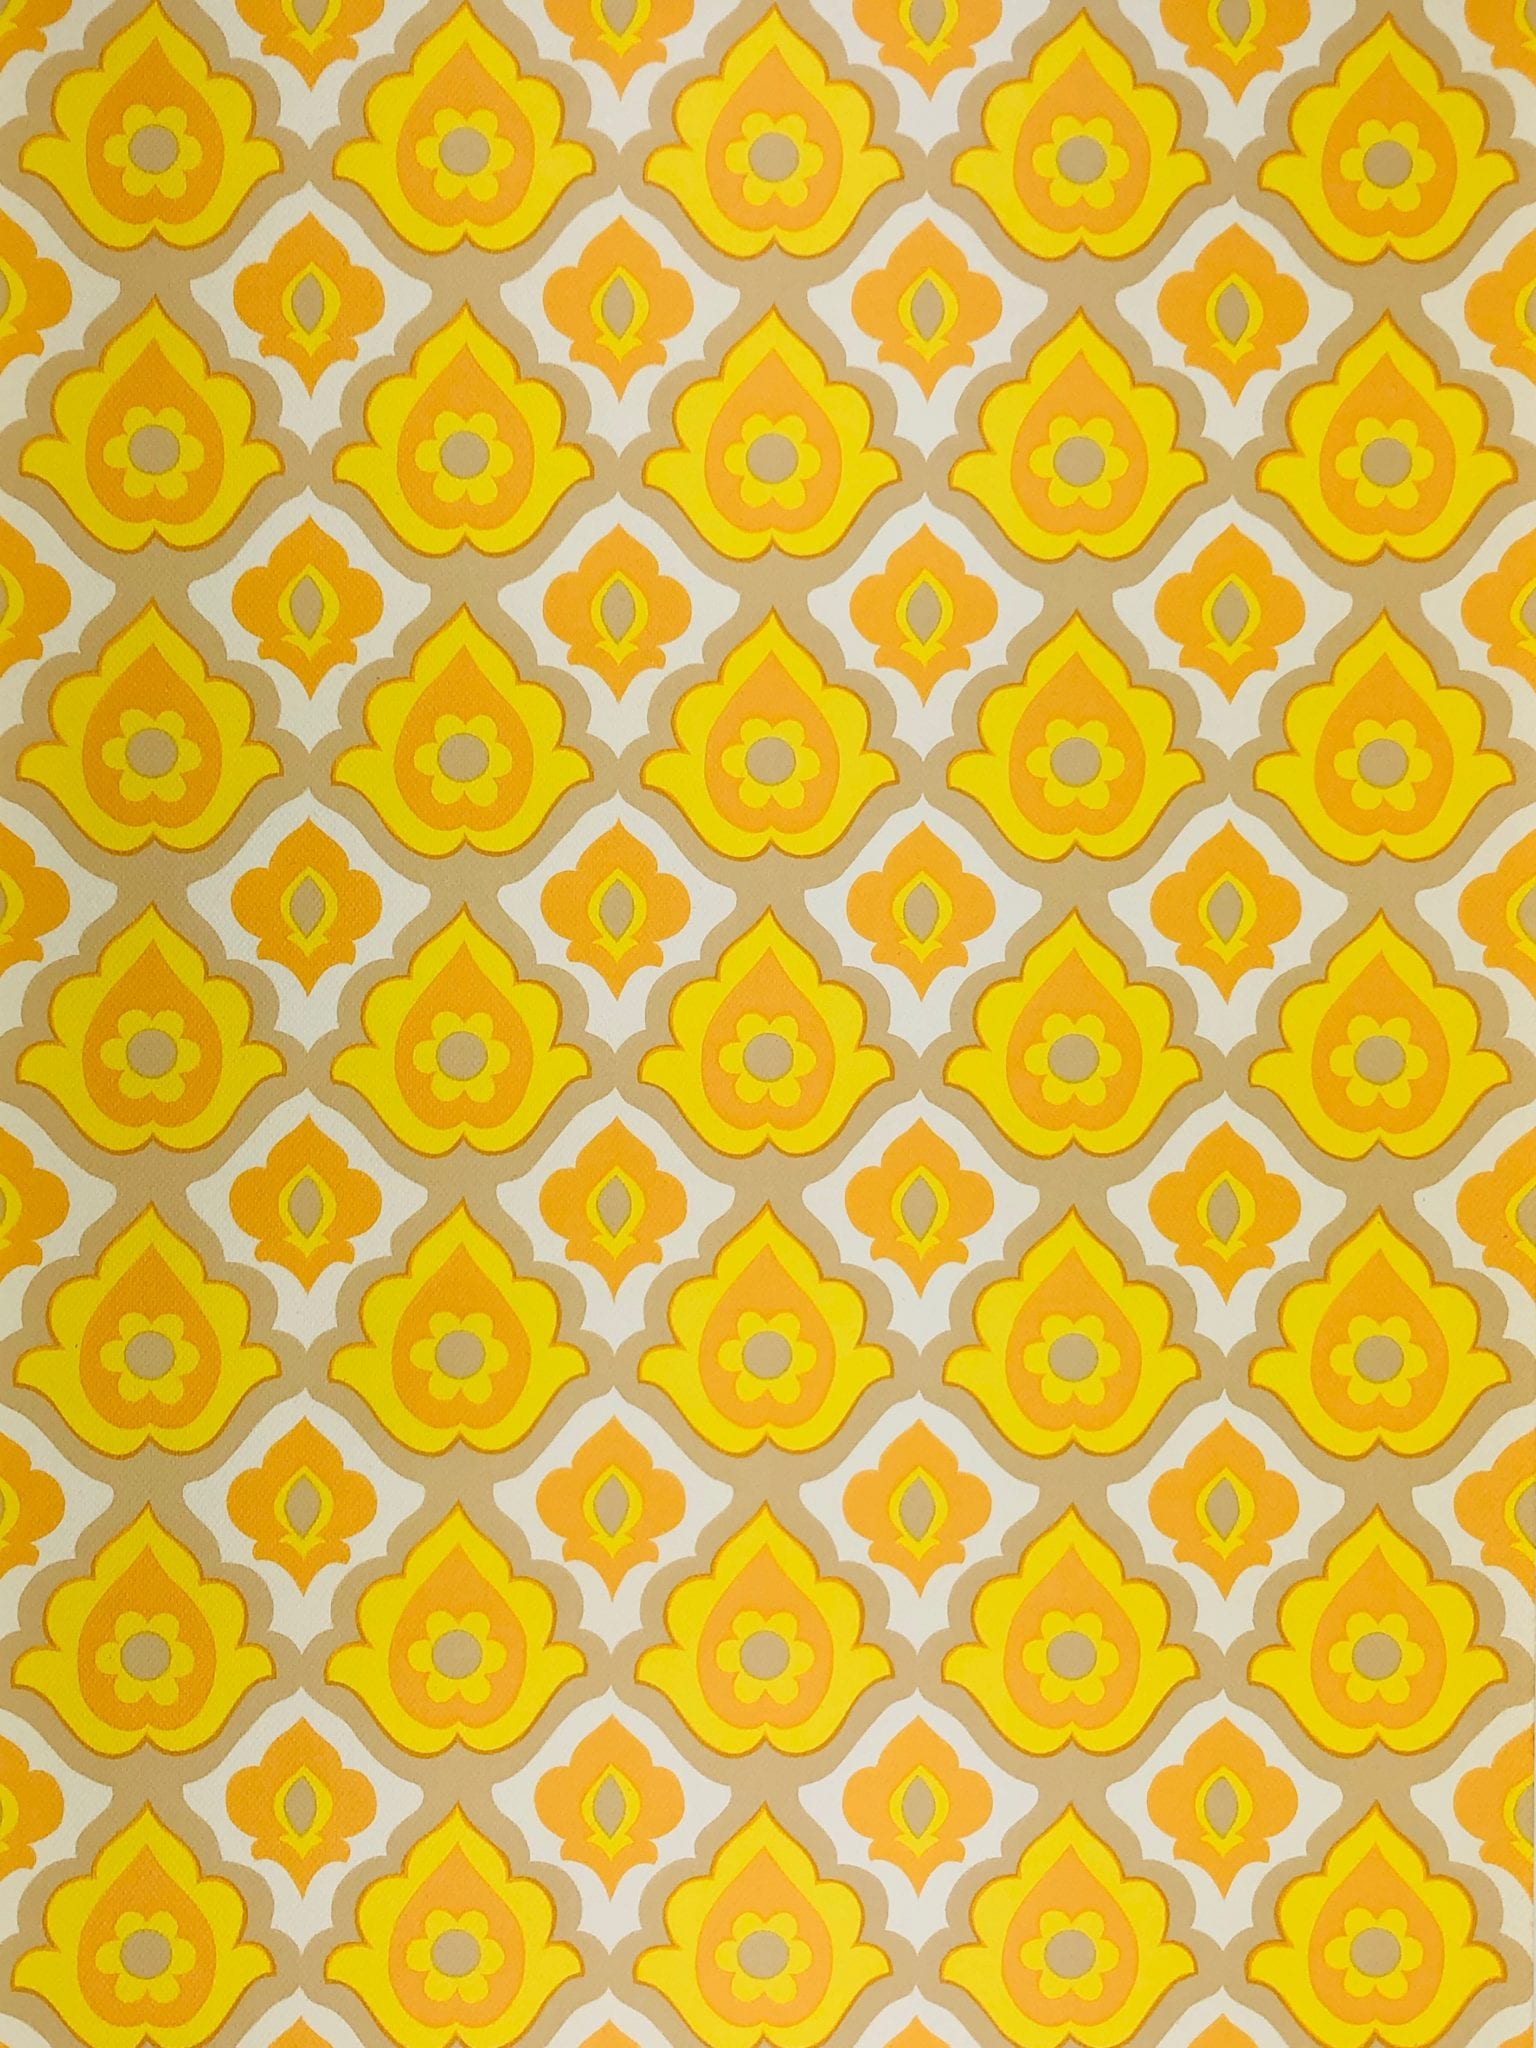 1970s vintage yellow geometric